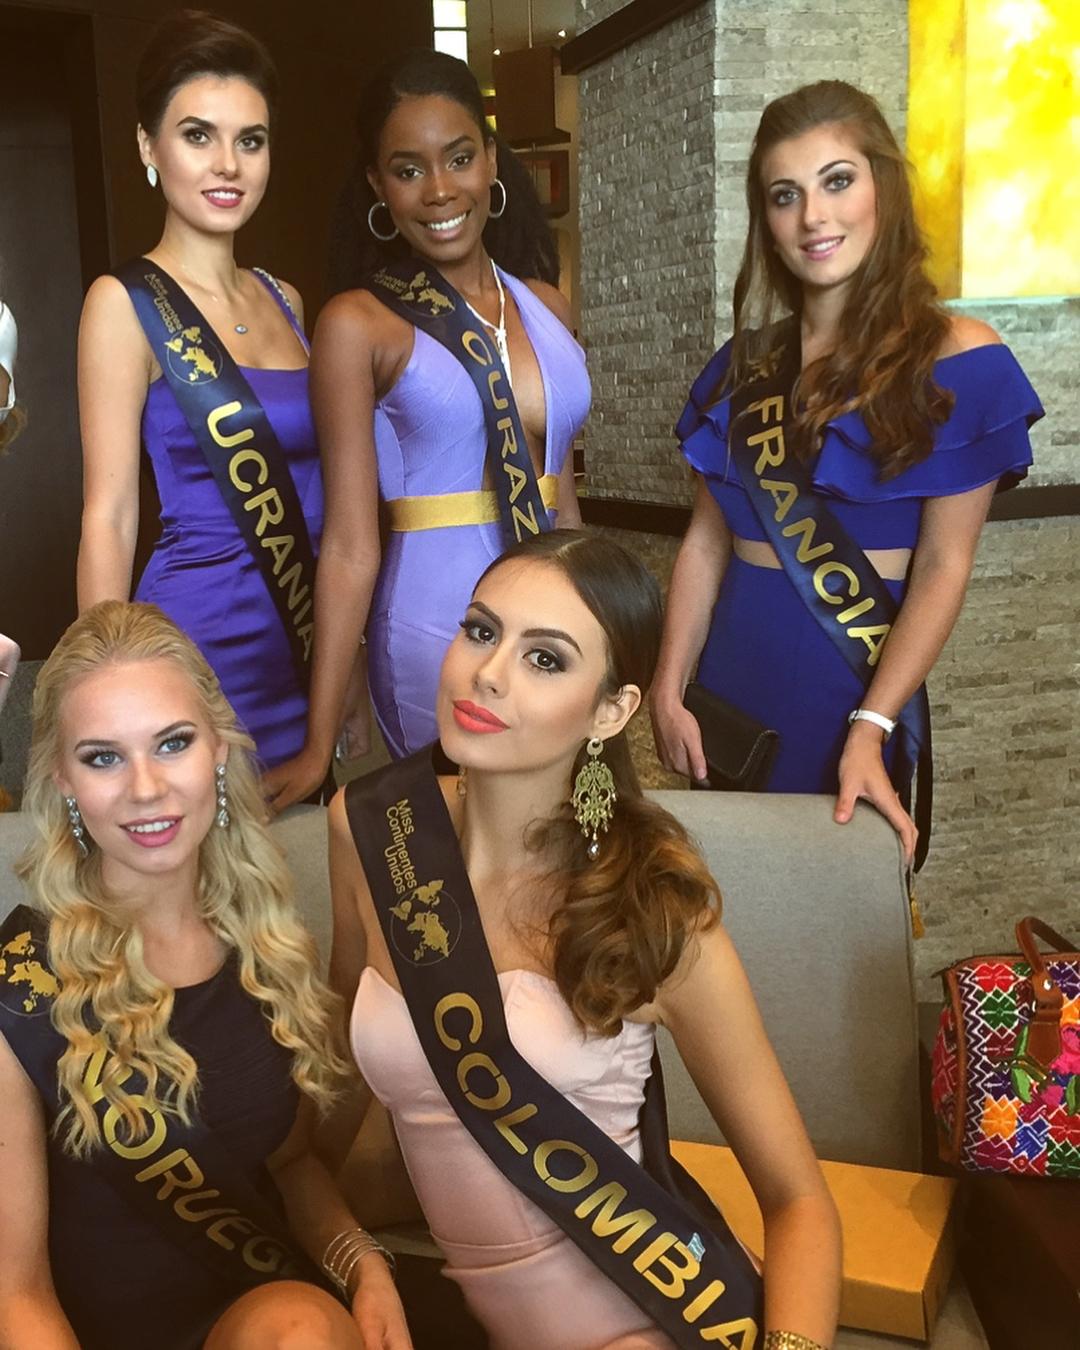 yennifer hernandez jaimes, miss colombia continentes unidos 2017. - Página 4 Xcyu25uf